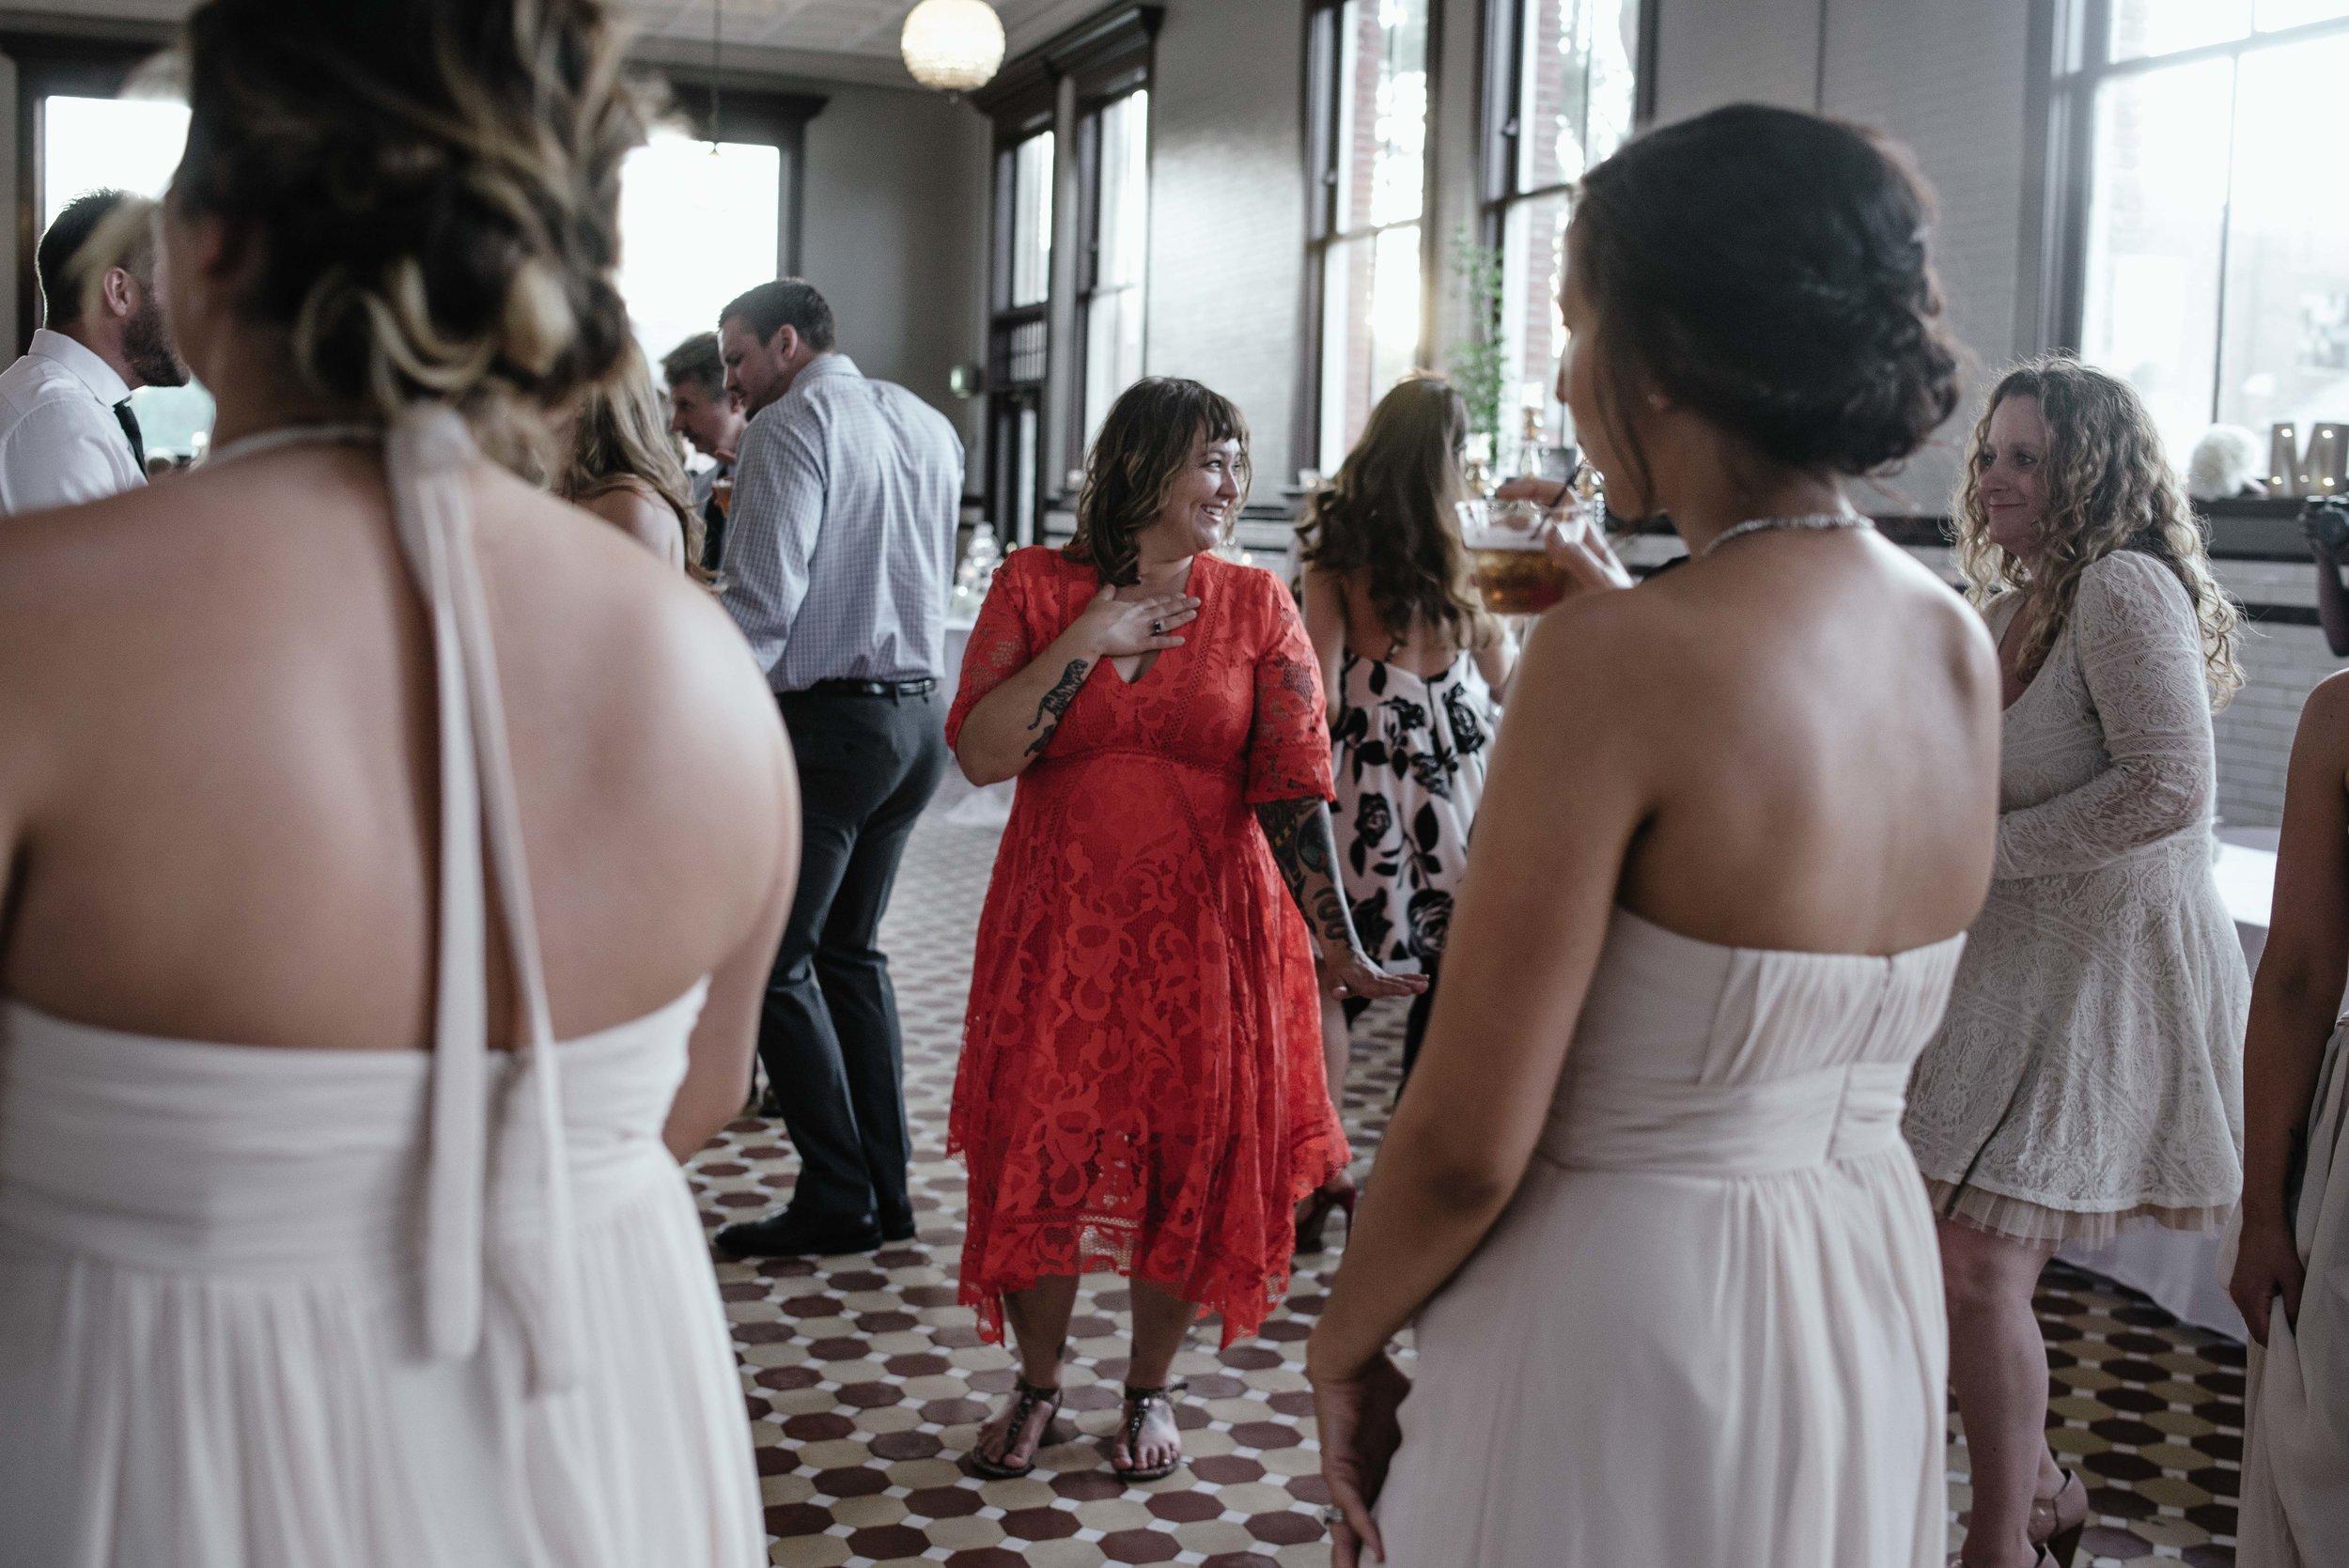 Mina-Steve-Blog-Indianapolis-Wedding-175.jpg